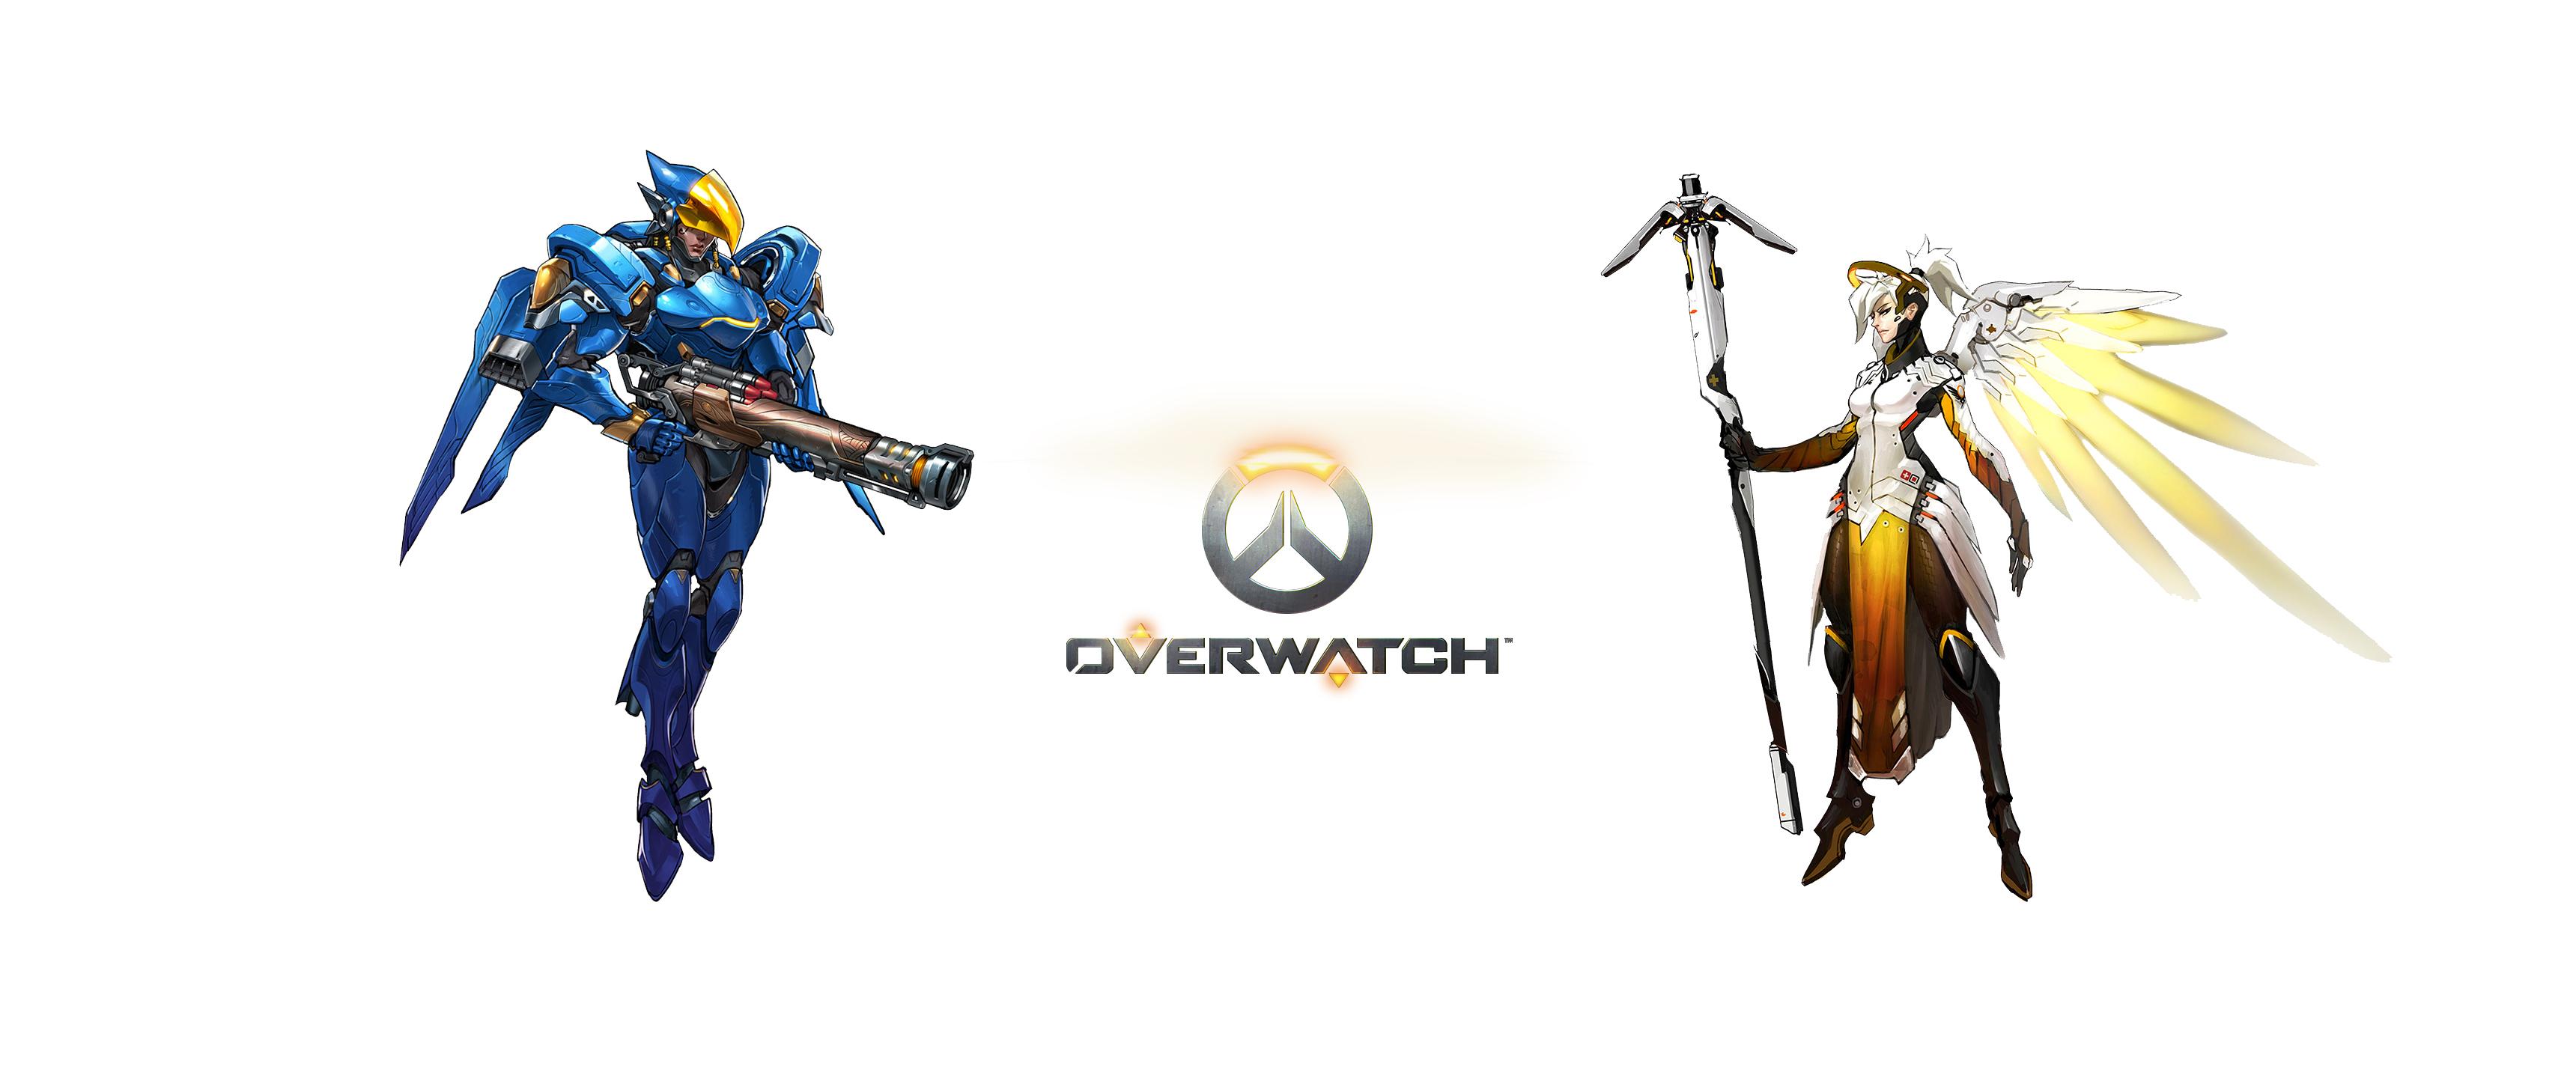 Overwatch Fondo De Pantalla Hd Fondo De Escritorio